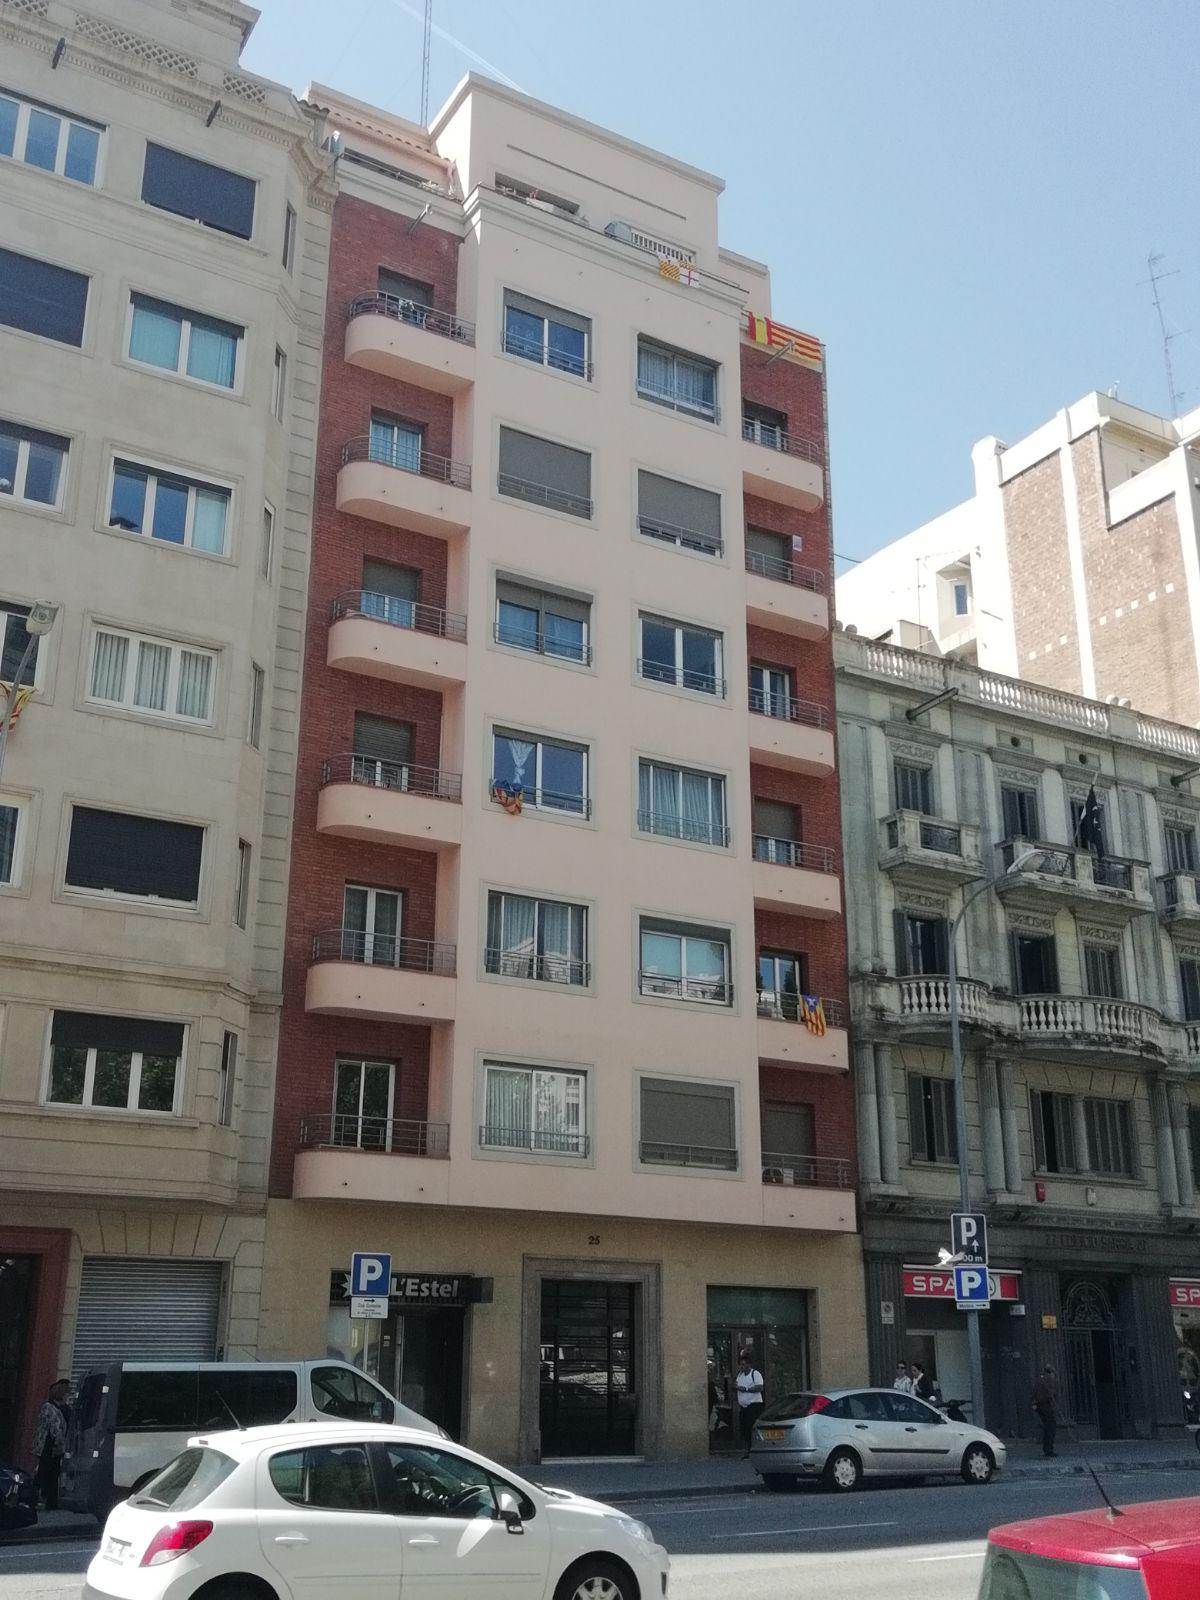 206142 Apartamento en venta en Eixample, Antiga Esquerre Eixample 1